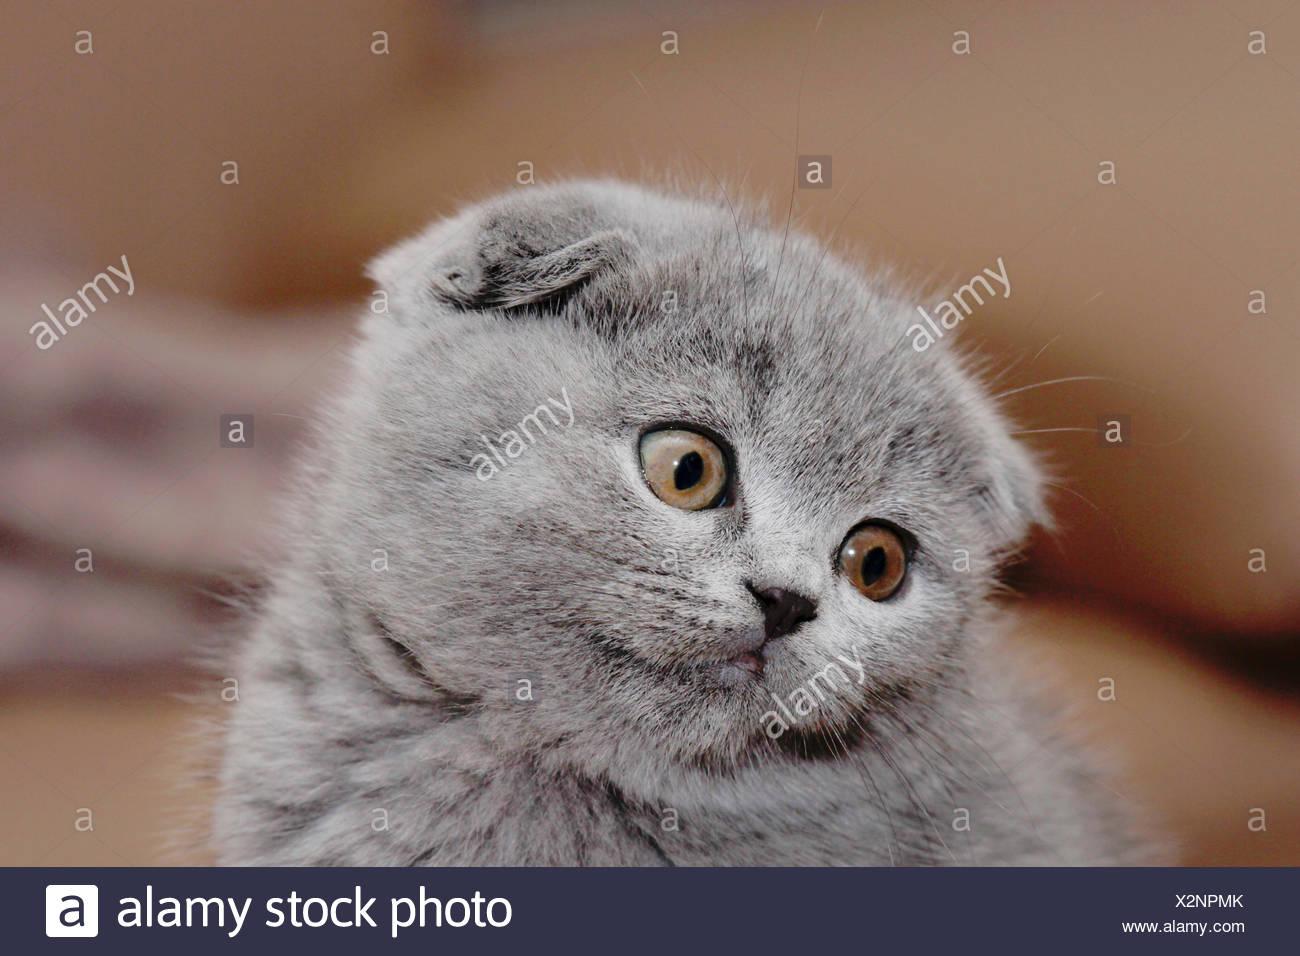 British Shorthair (Felis silvestris f. catus), little grey-haired British Shorthair kitten with floppy ears, portrait - Stock Image